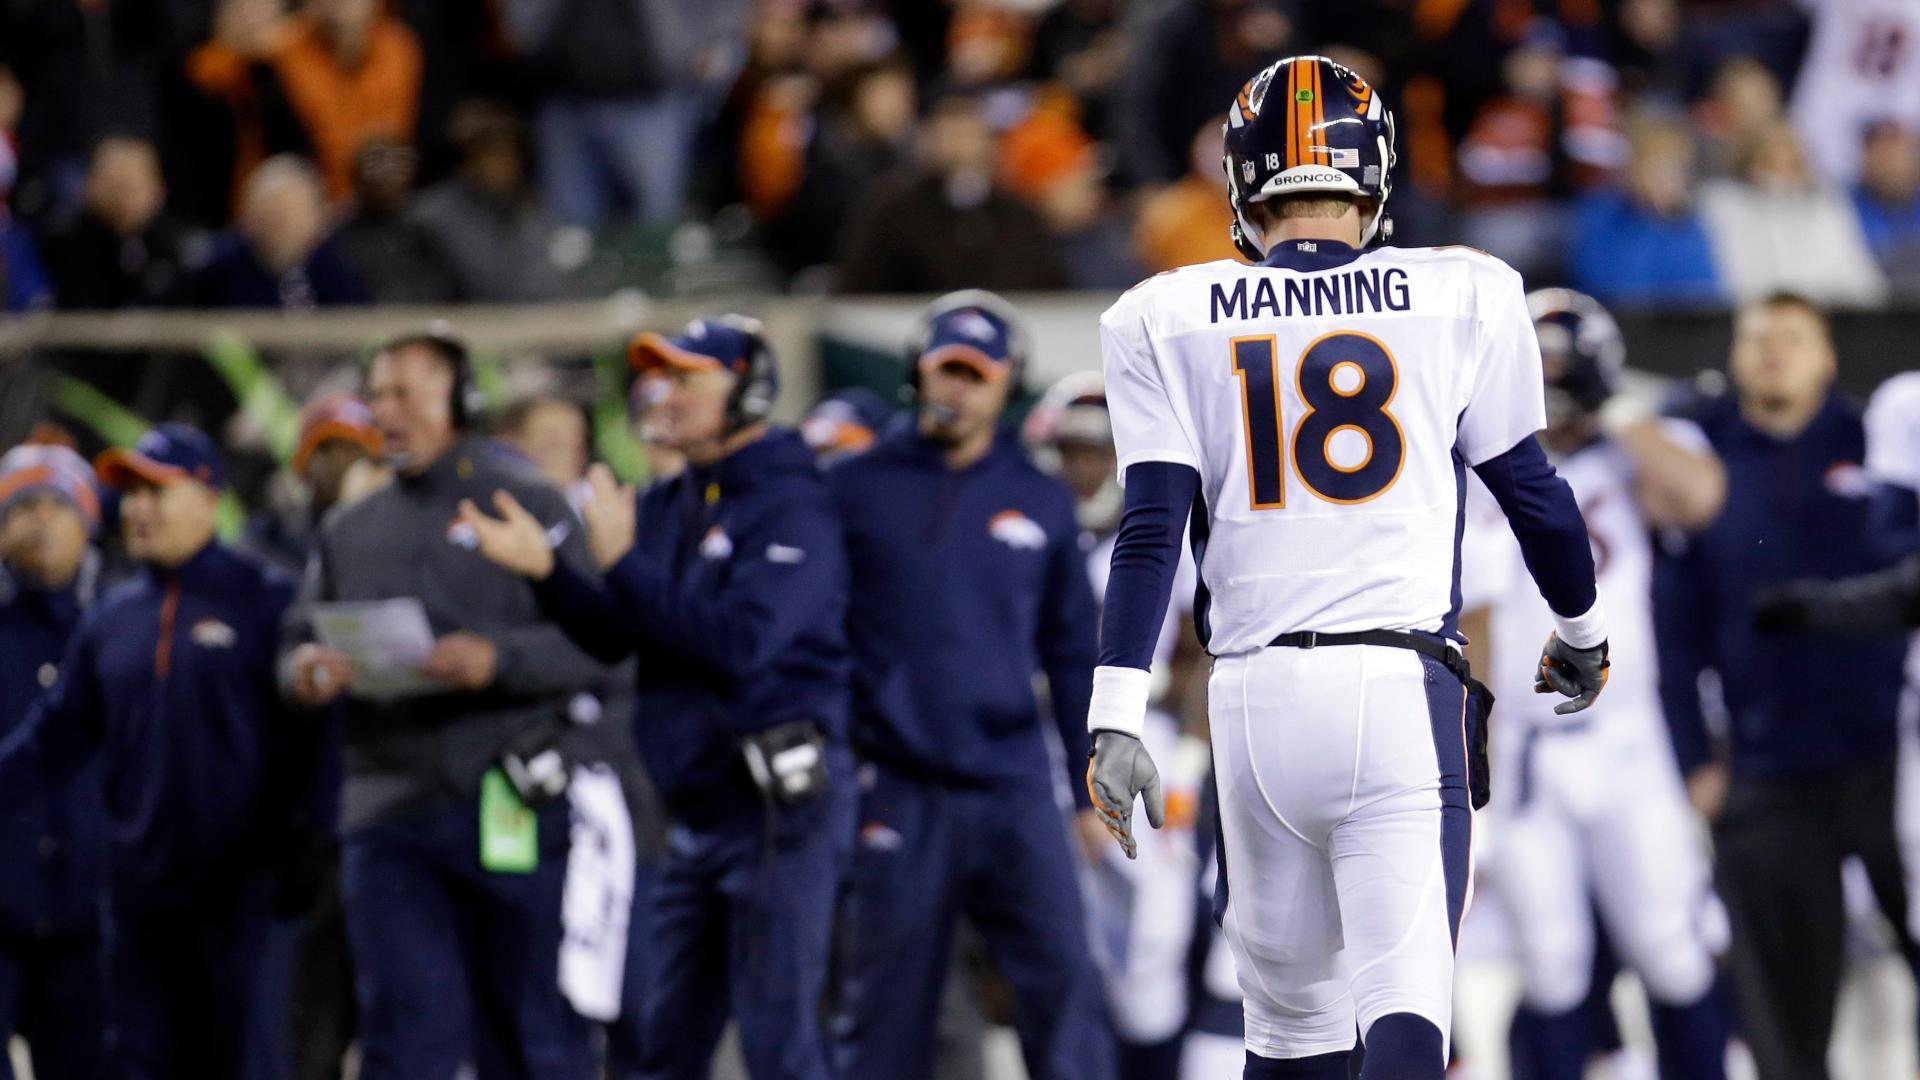 http://a.espncdn.com/media/motion/2014/1223/dm_141223_nfl_live_ot_Broncos1418/dm_141223_nfl_live_ot_Broncos1418.jpg